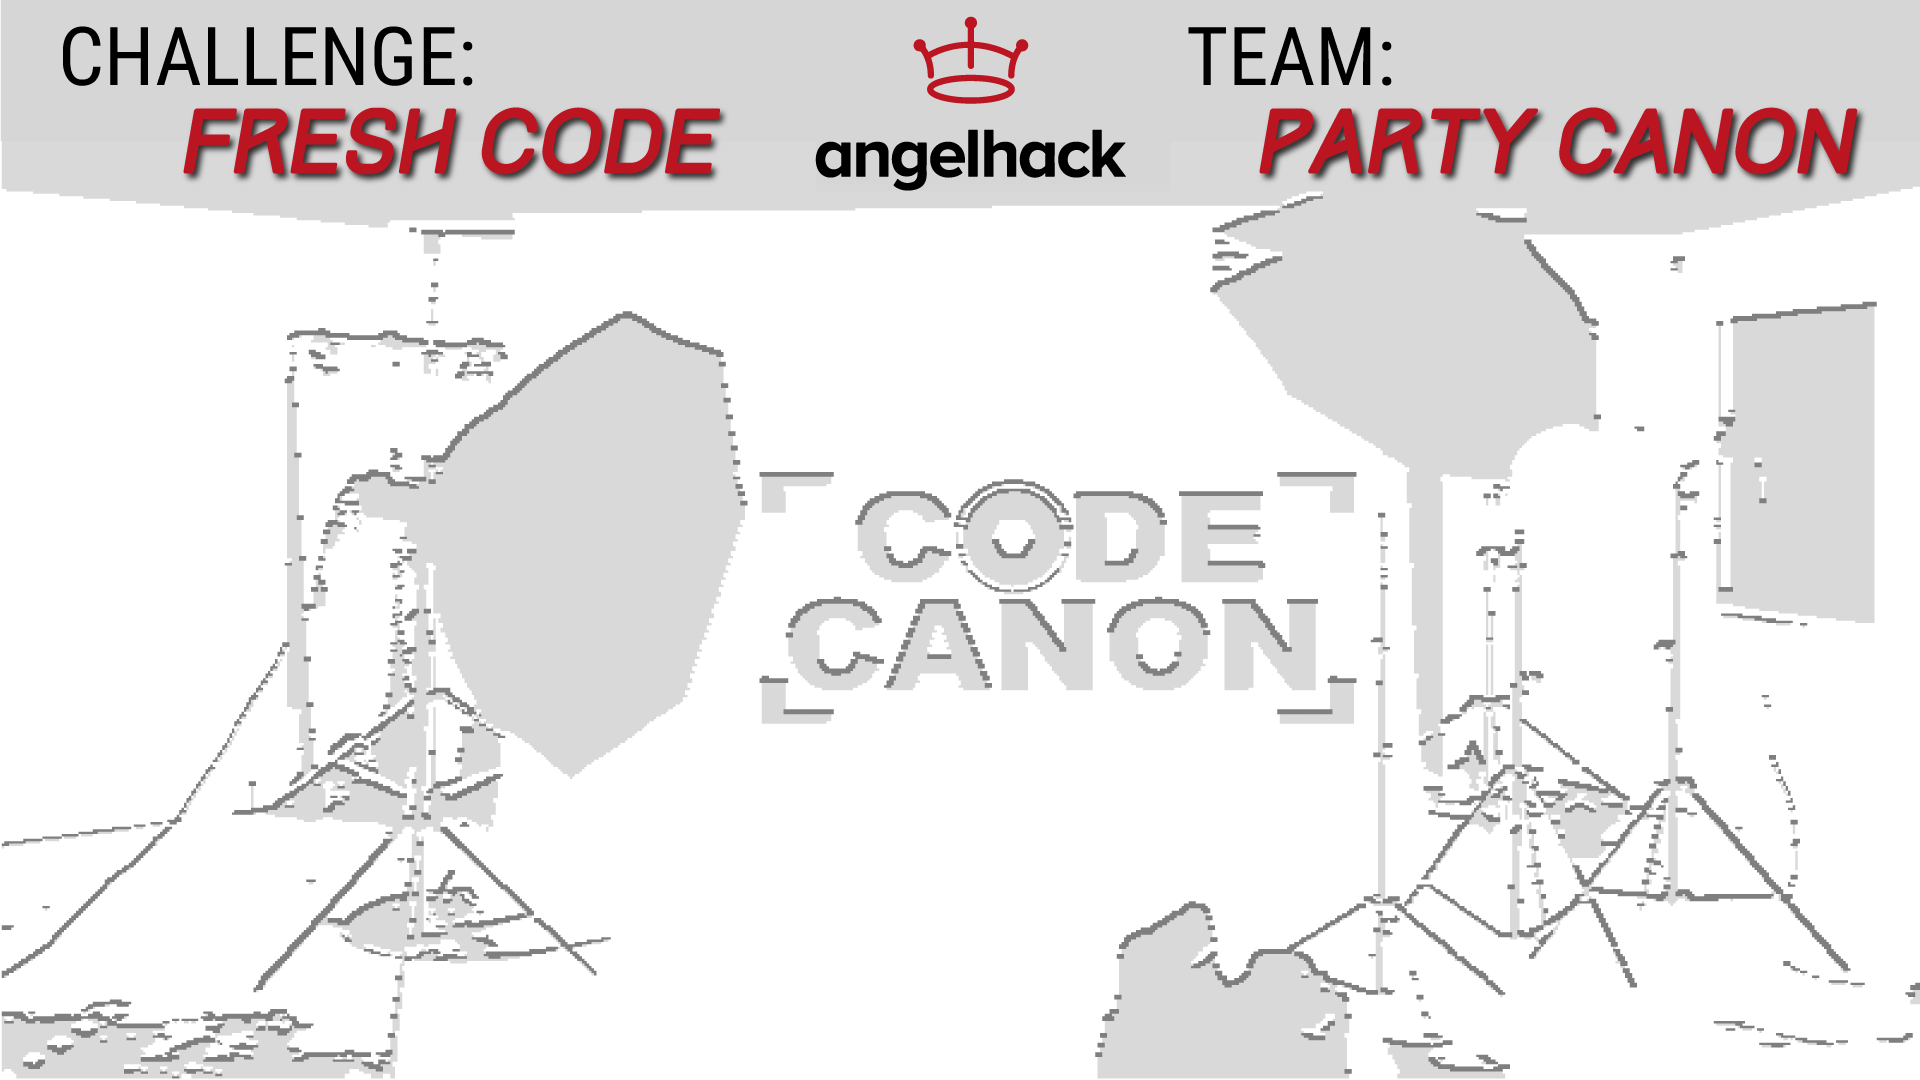 Party_canon_splashslide